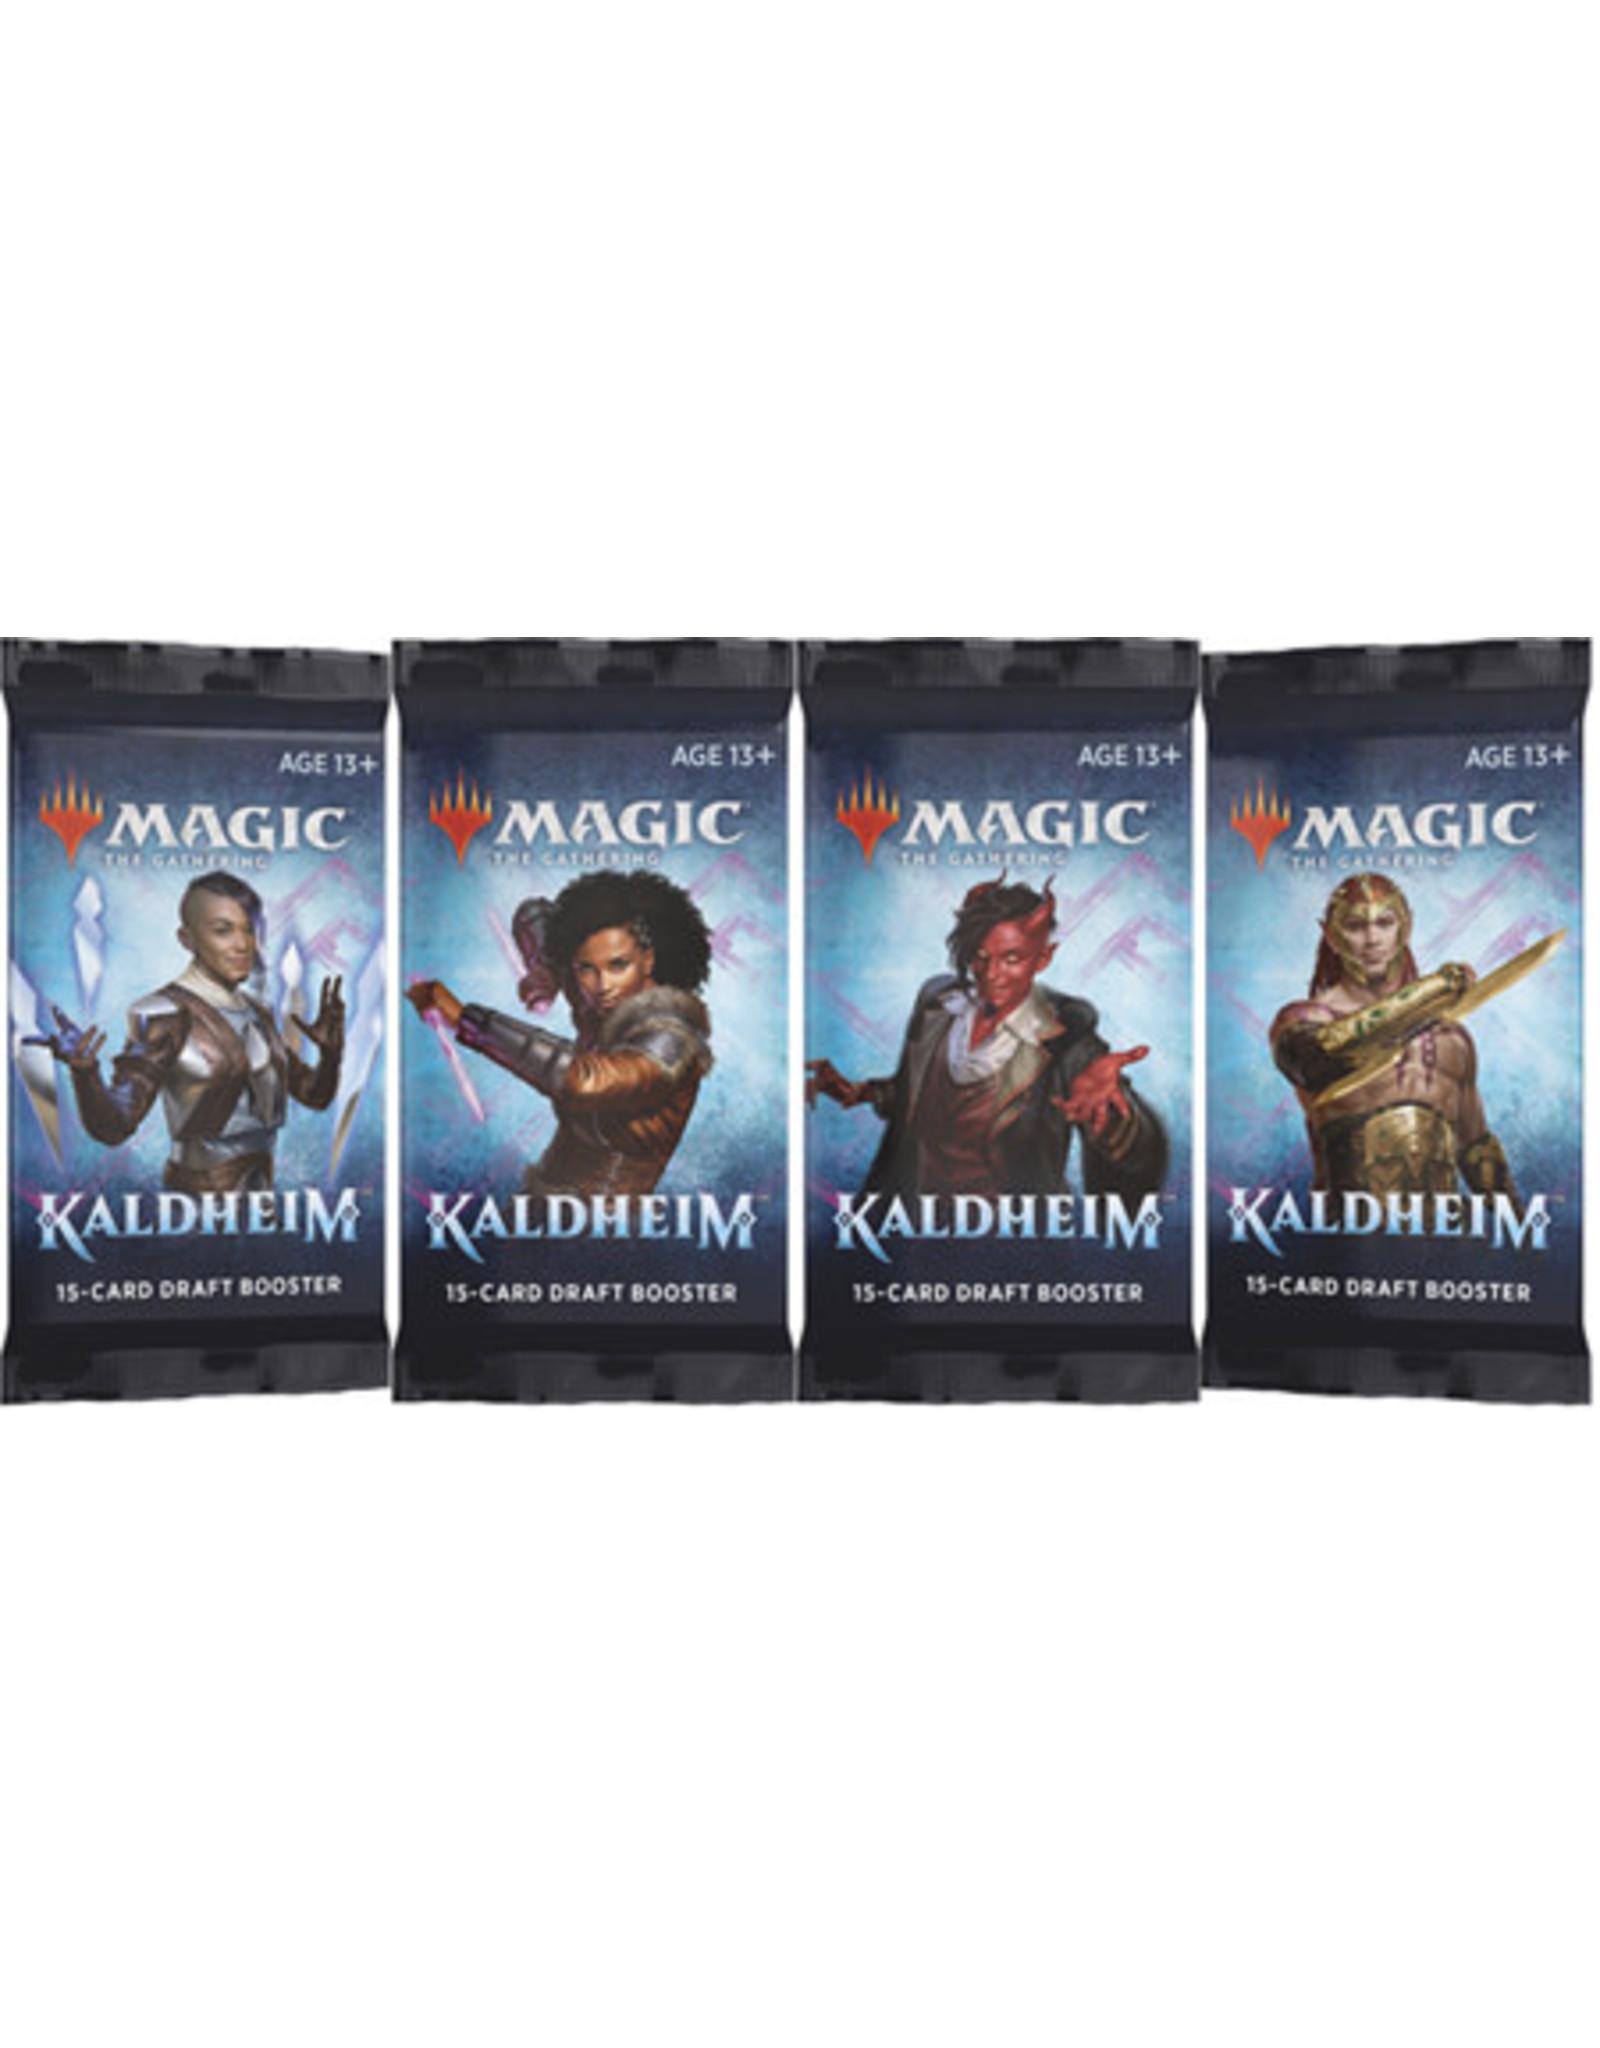 Magic Kaldheim Draft Booster